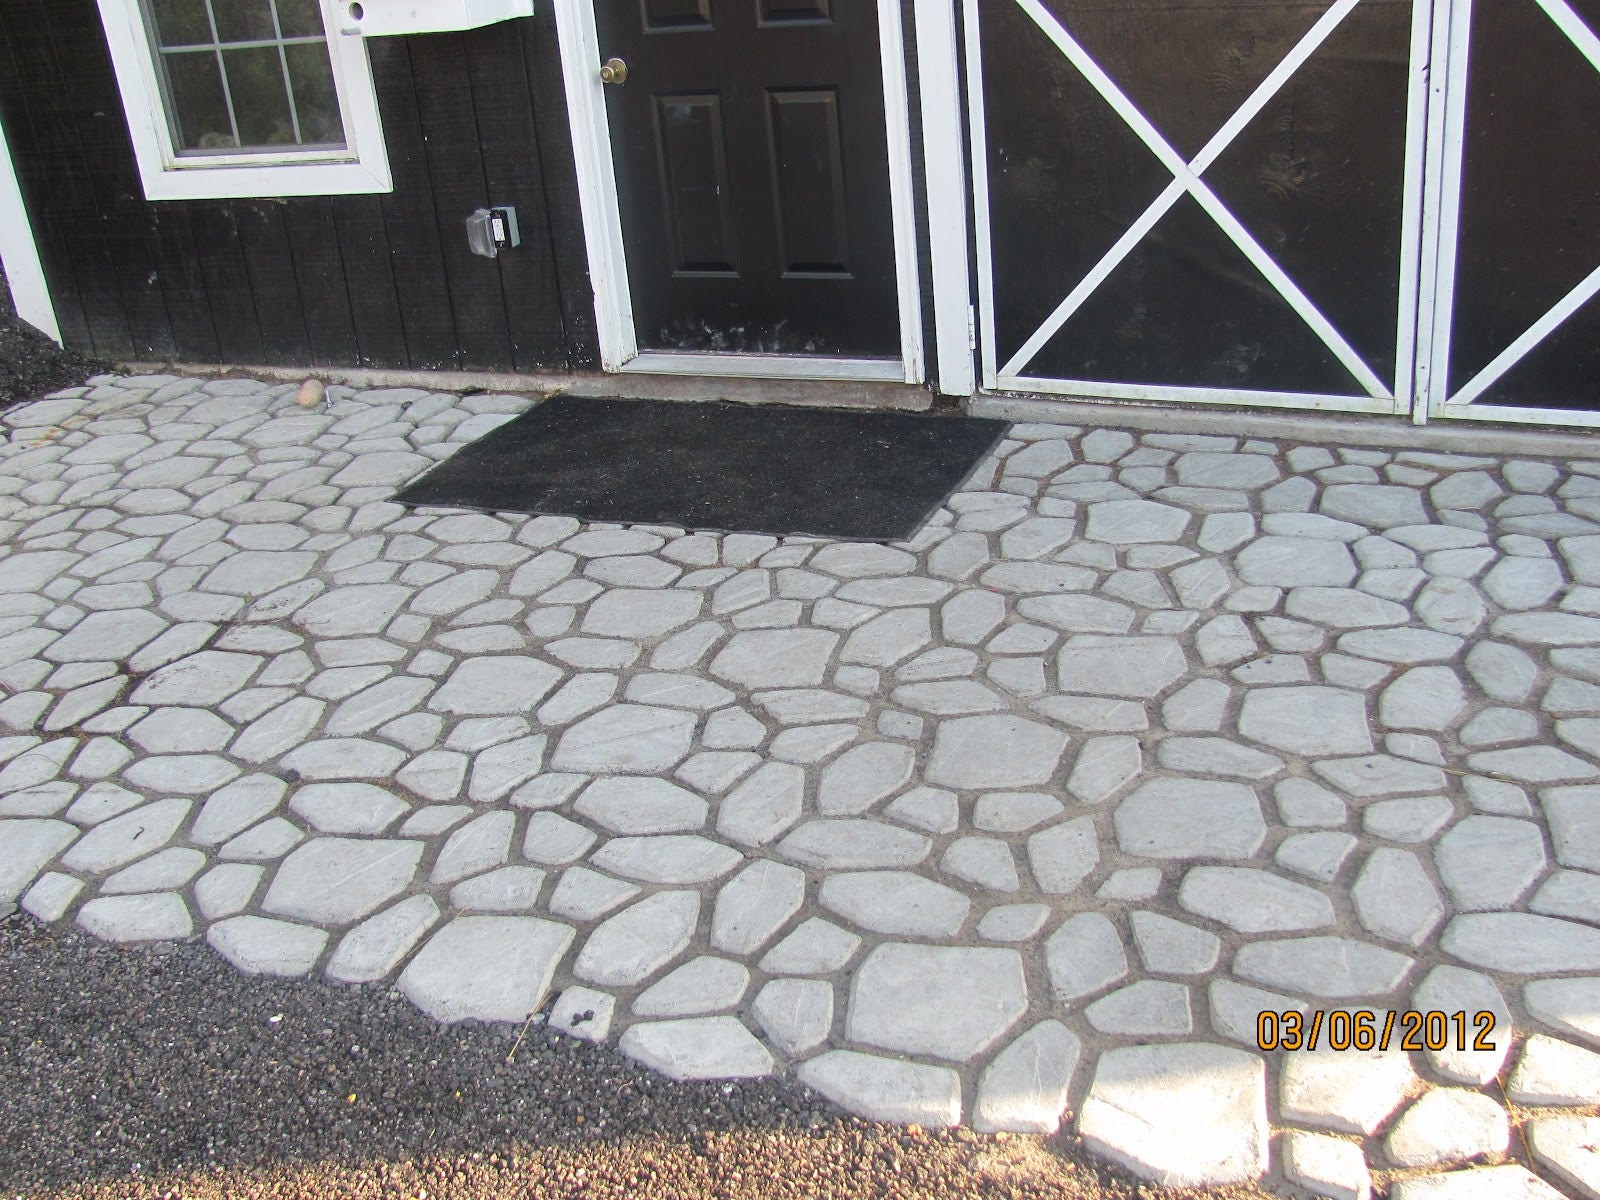 Molde pavimento bricolaje camino pl stico fabricante de moldes manualmente pavimento cemento - Pavimento jardin ...